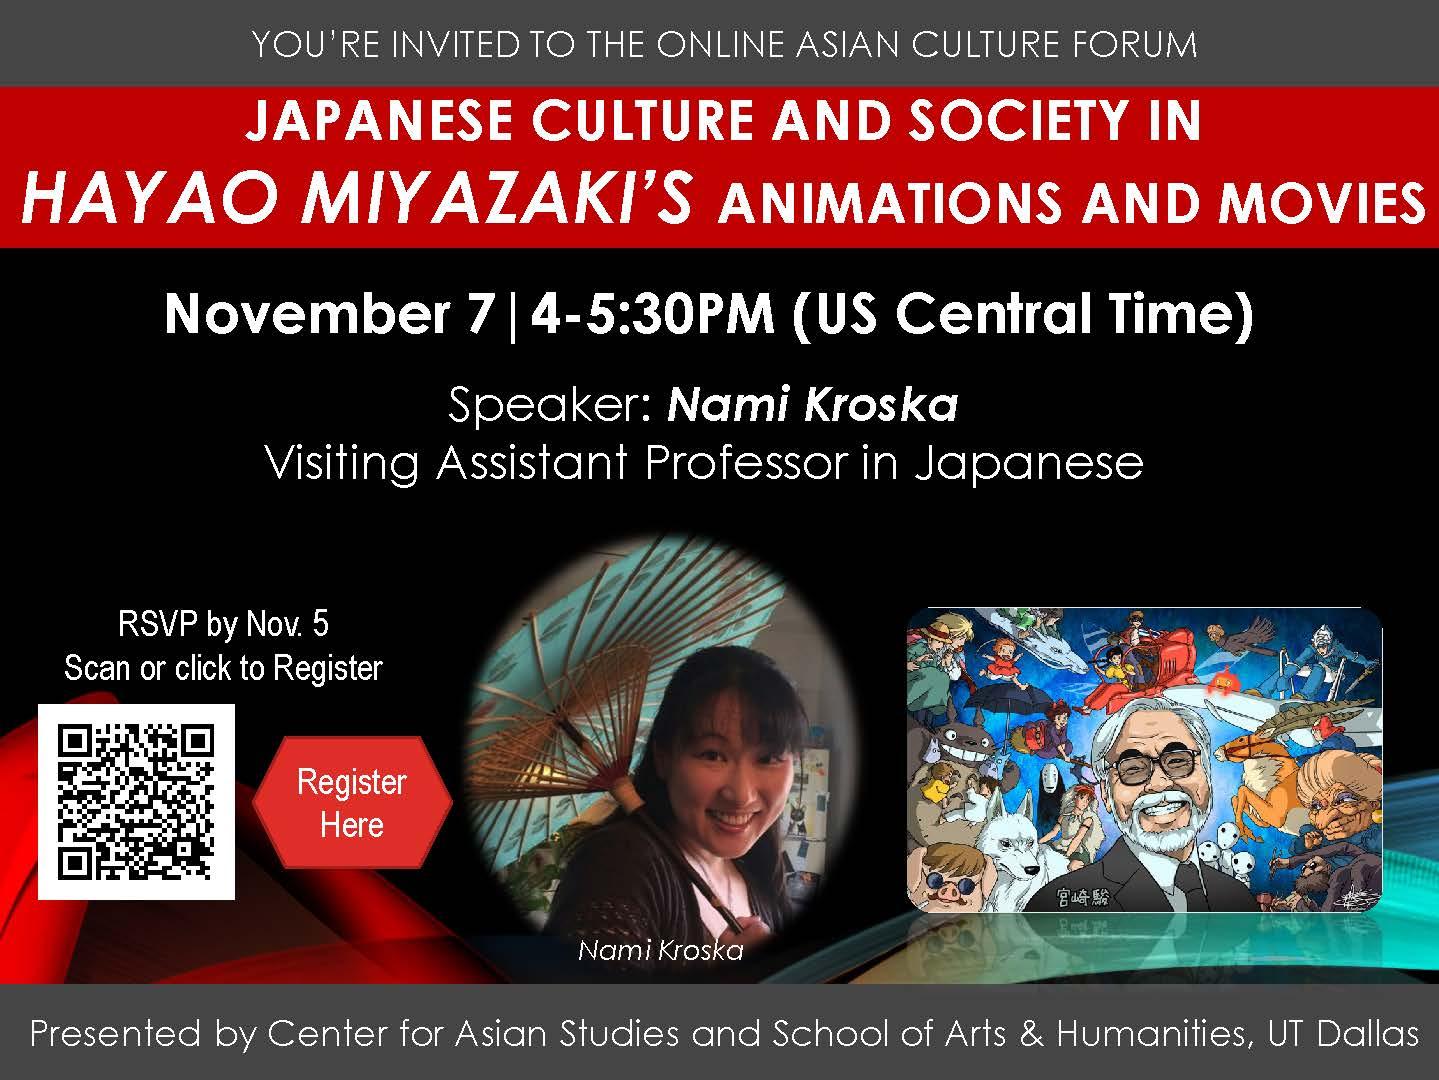 Japanese Culture and society in Hayao Miyazaki's movies, pdf